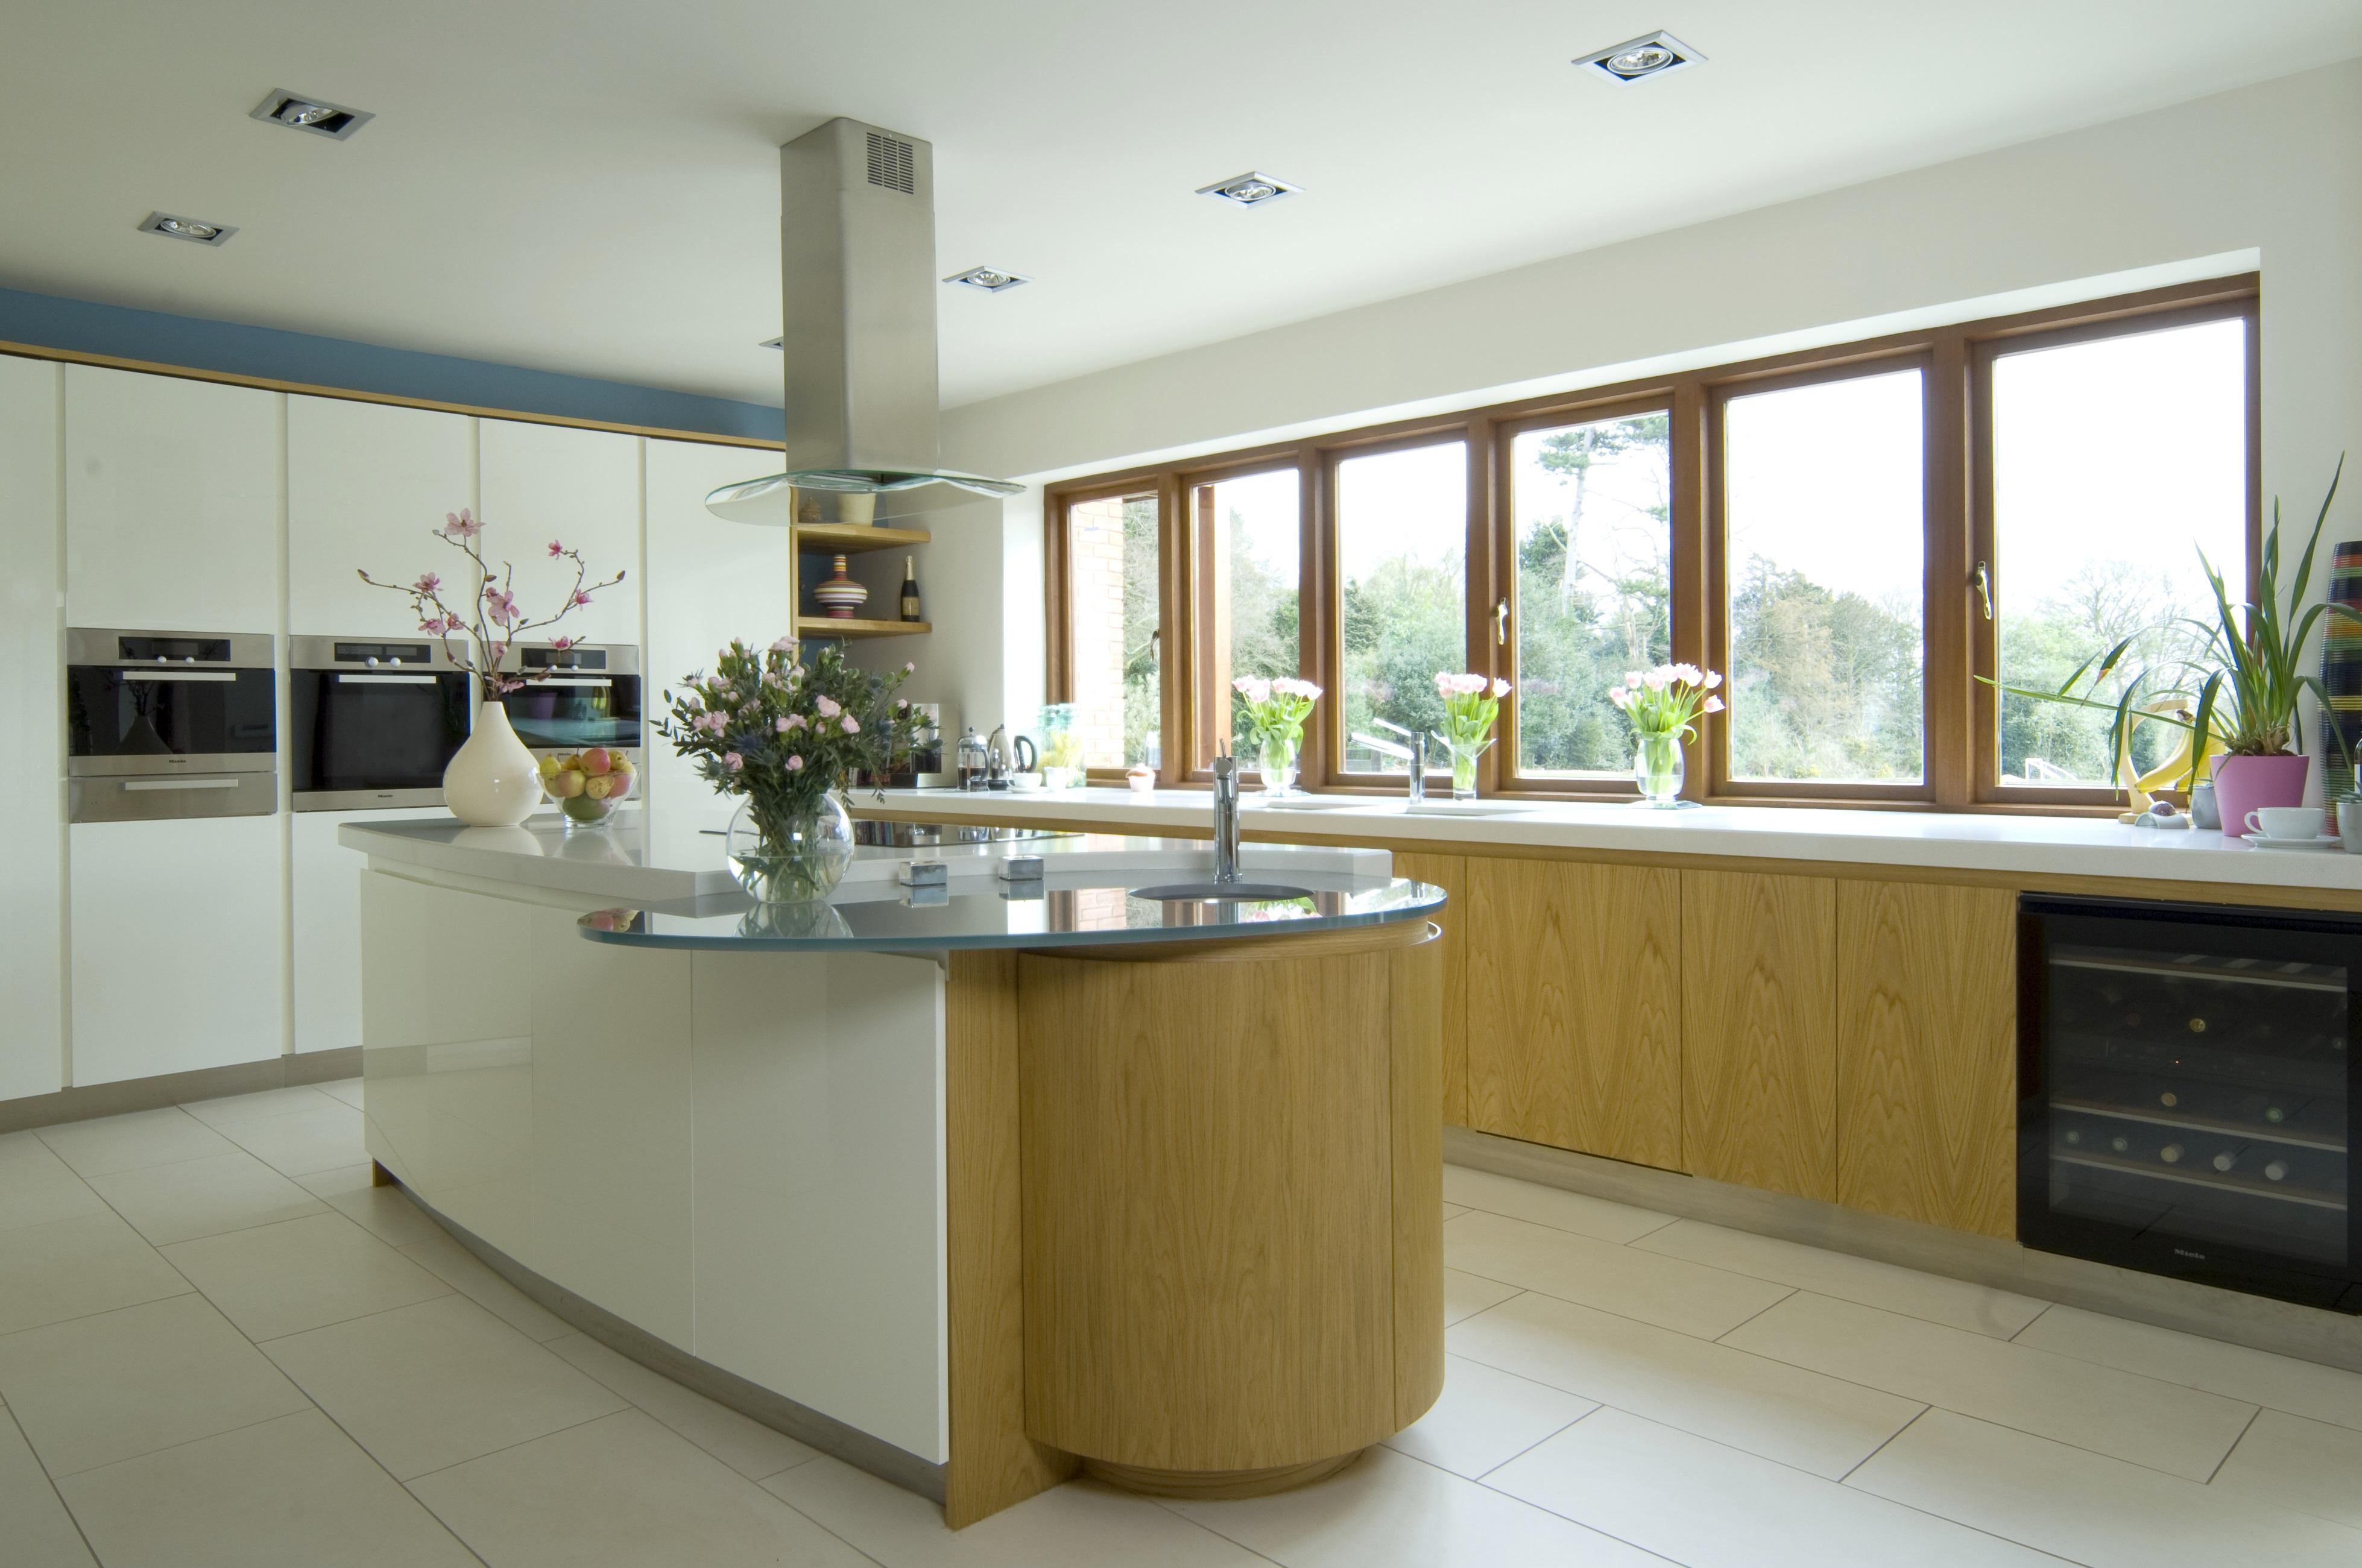 Nicholas Bell Kitchen Bespoke Handmade Kitchens Thame